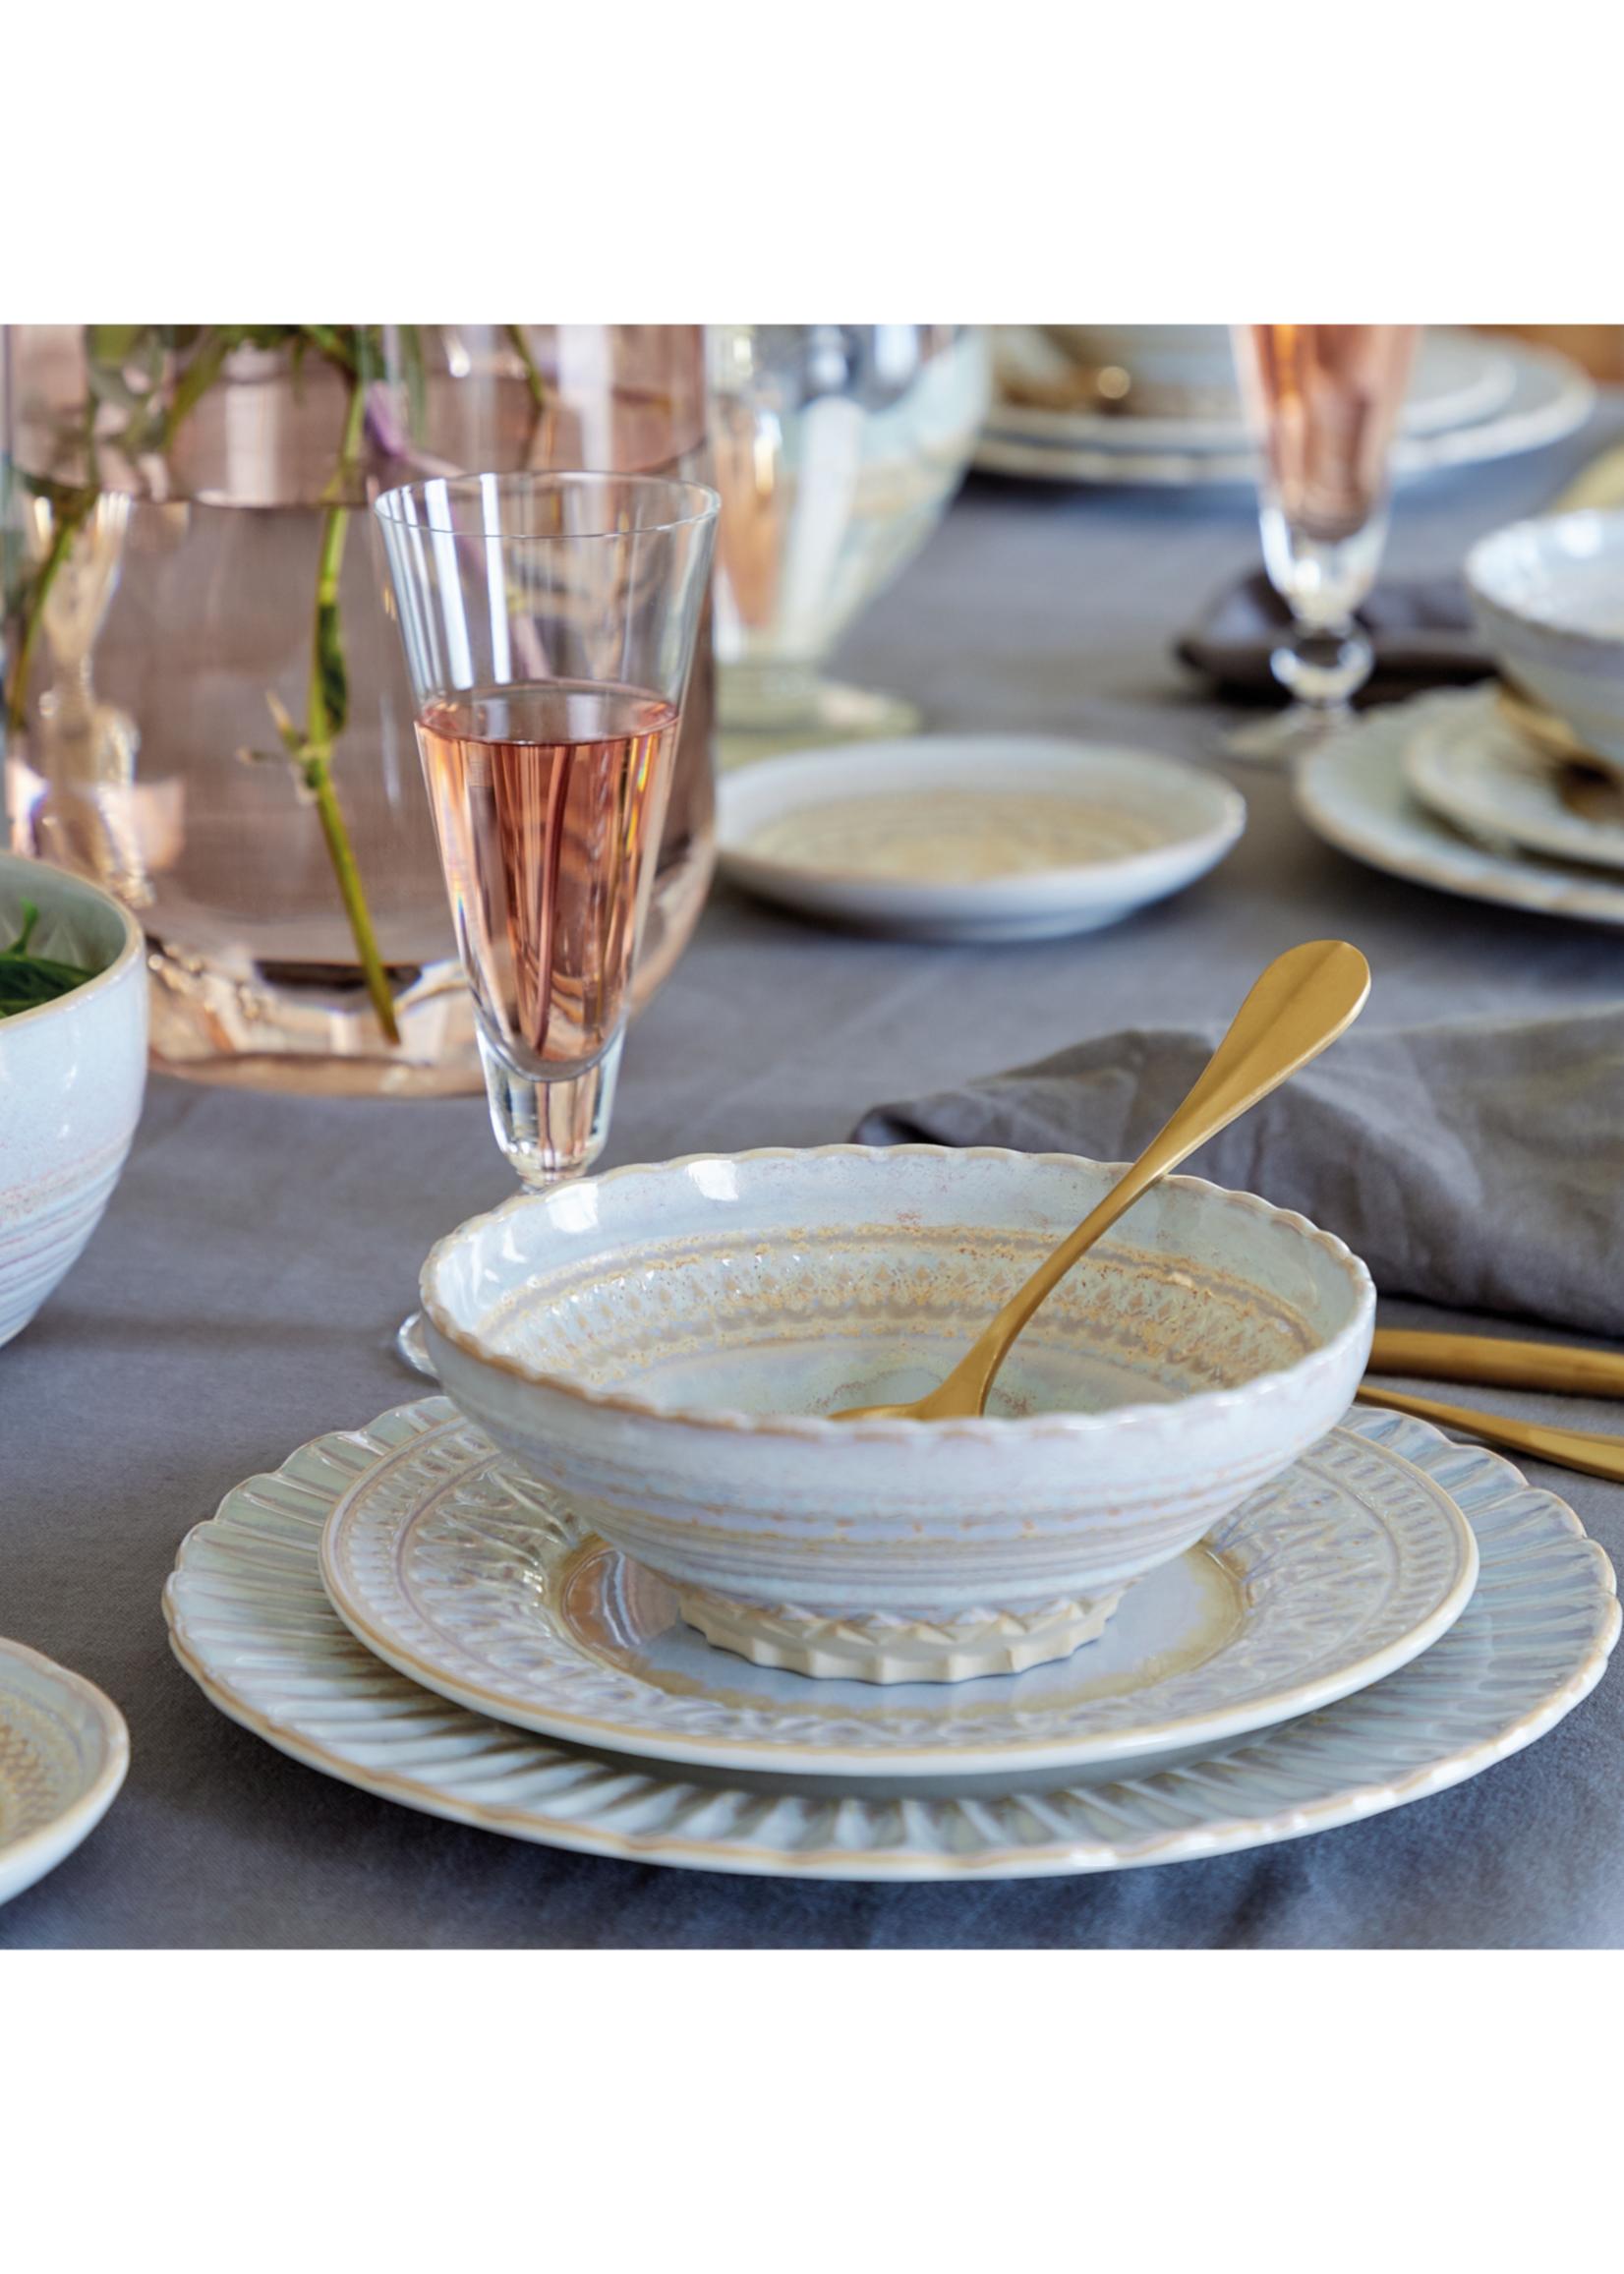 Casafina Cristal Dinner Plate